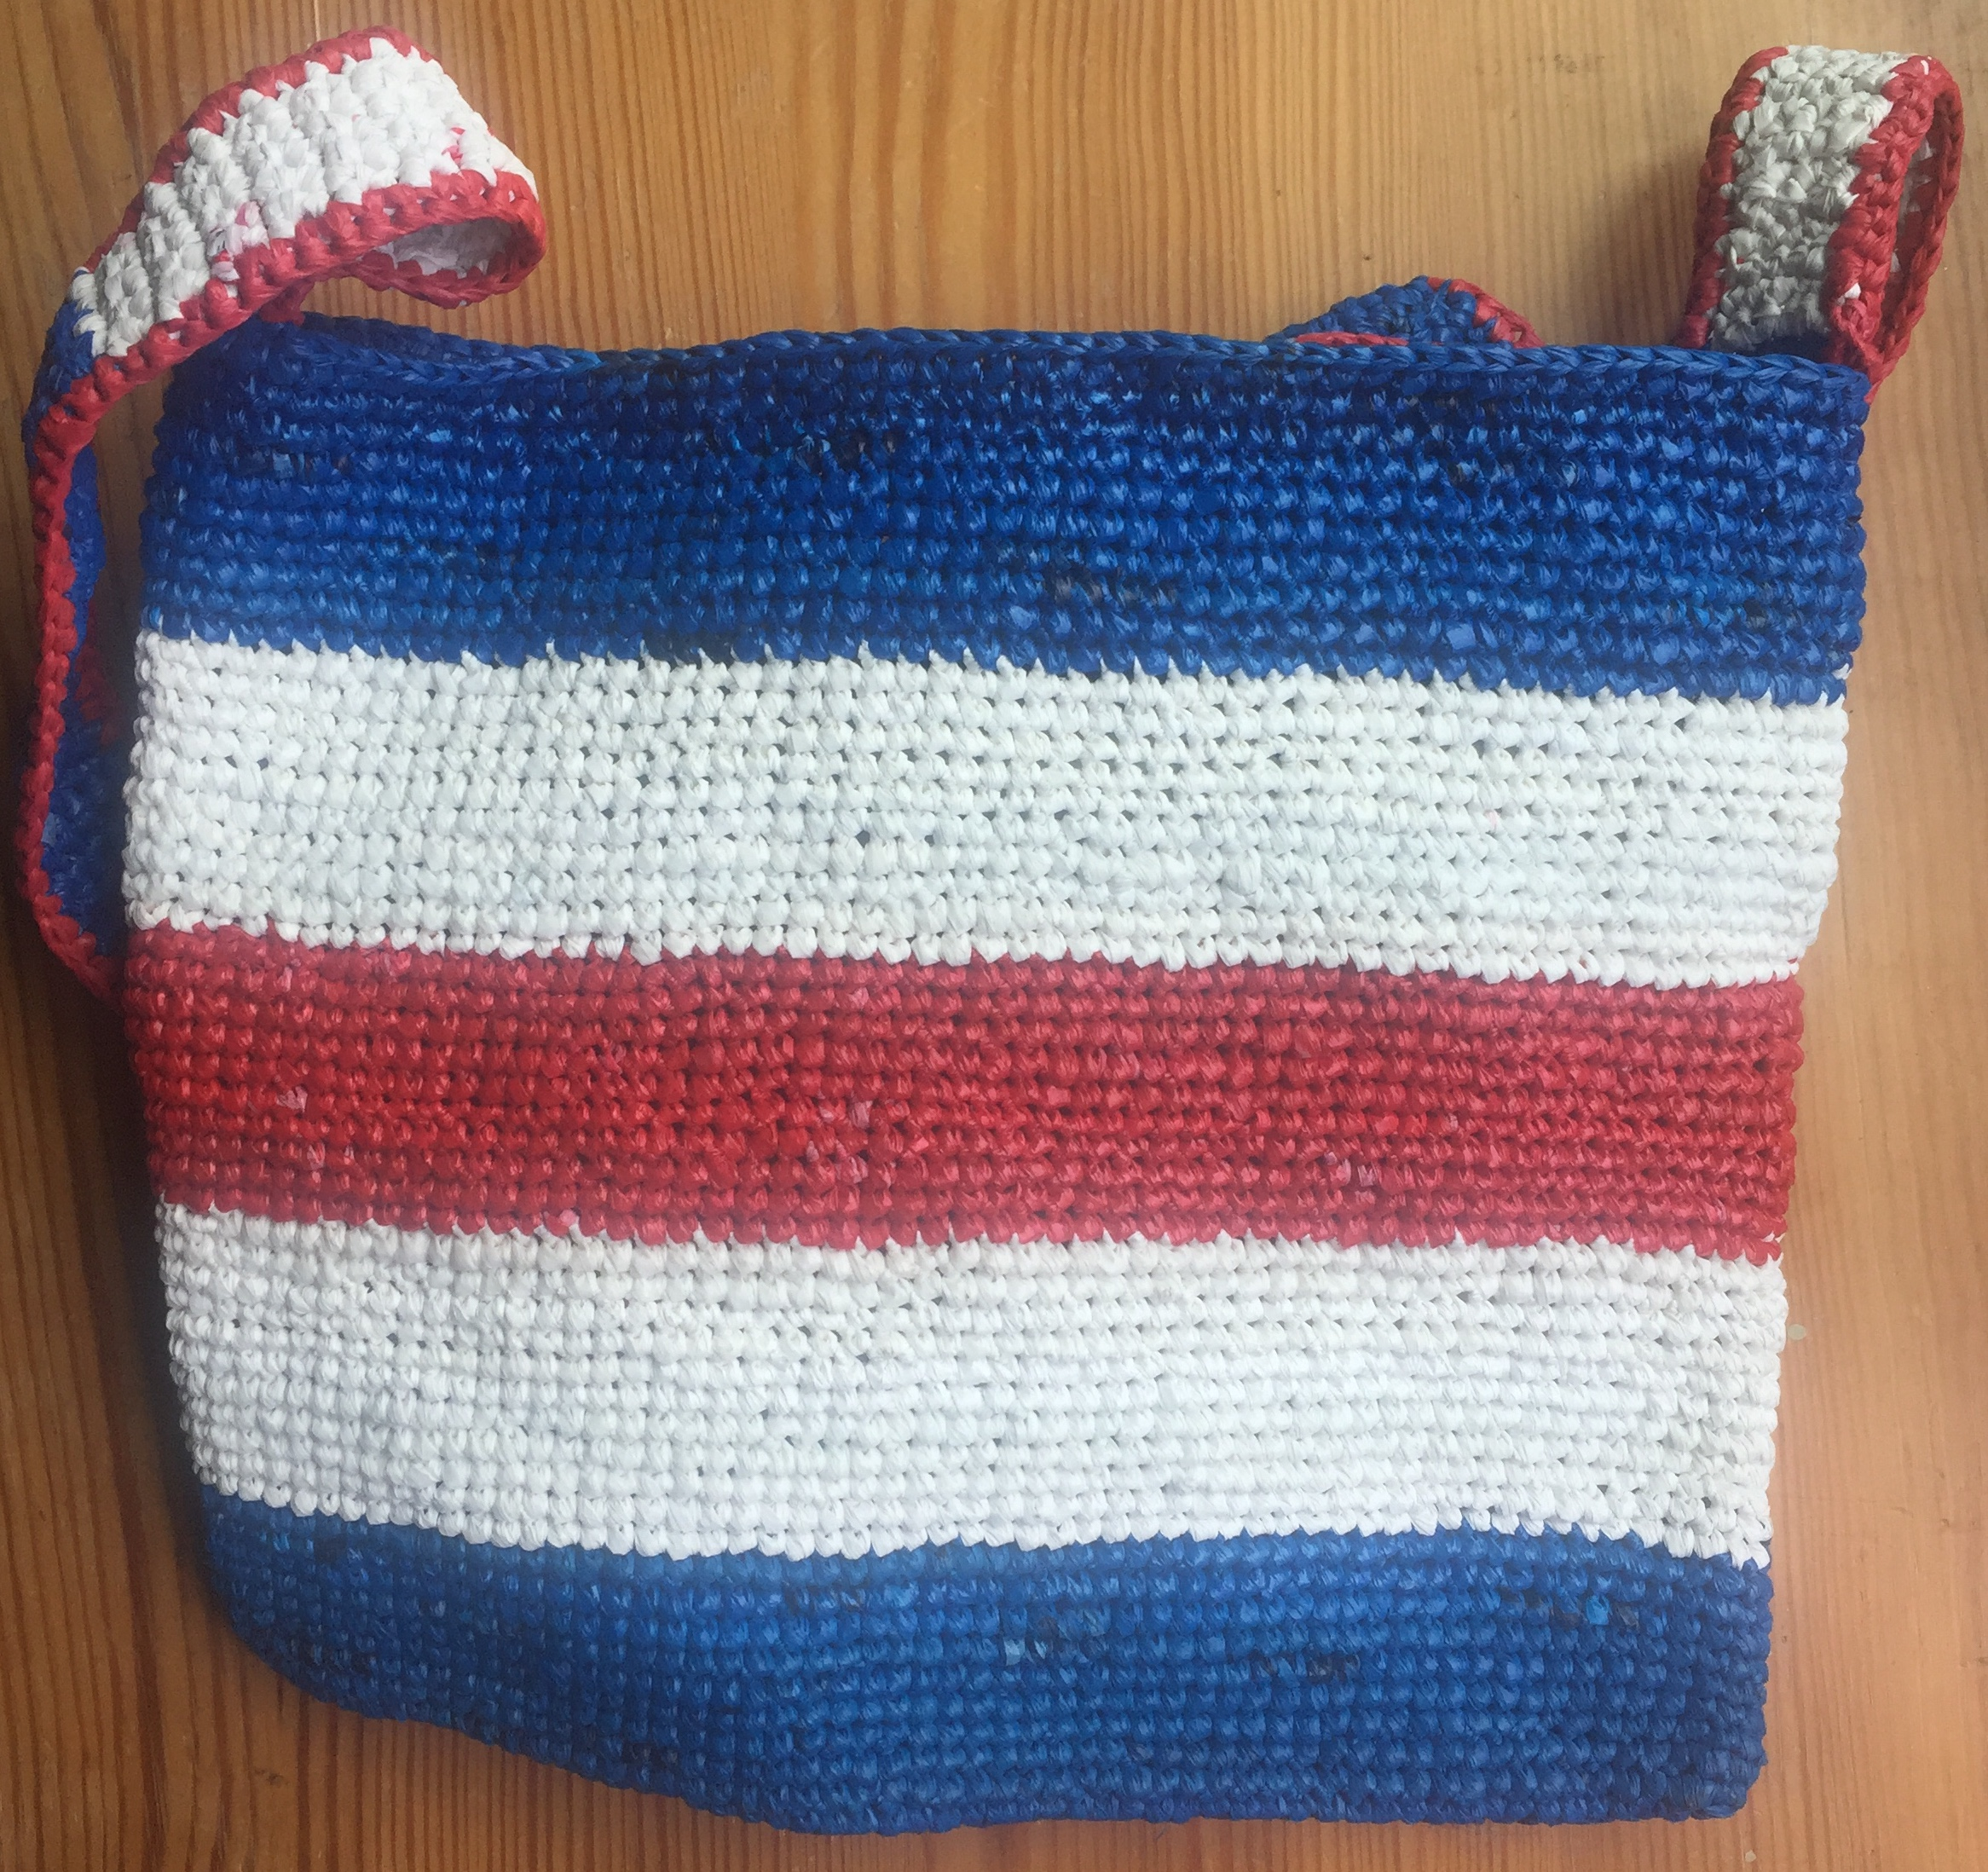 Recycled plastic handbag